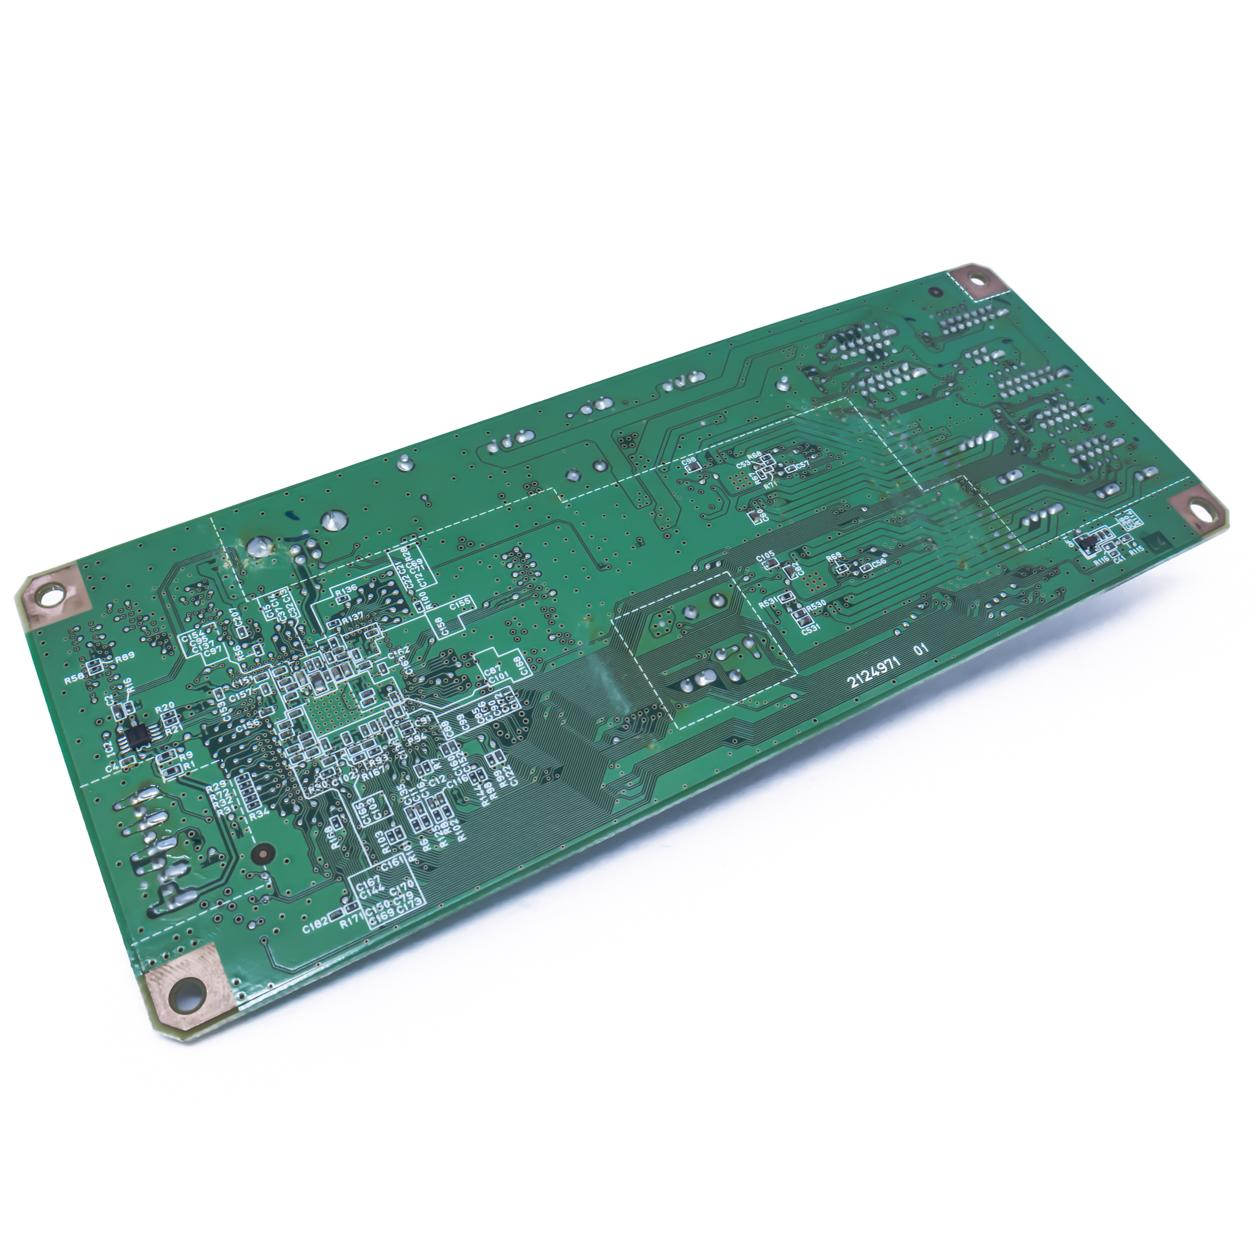 Placa Lógica da Impressora Epson T1110 - PartNumber: 2124970-04